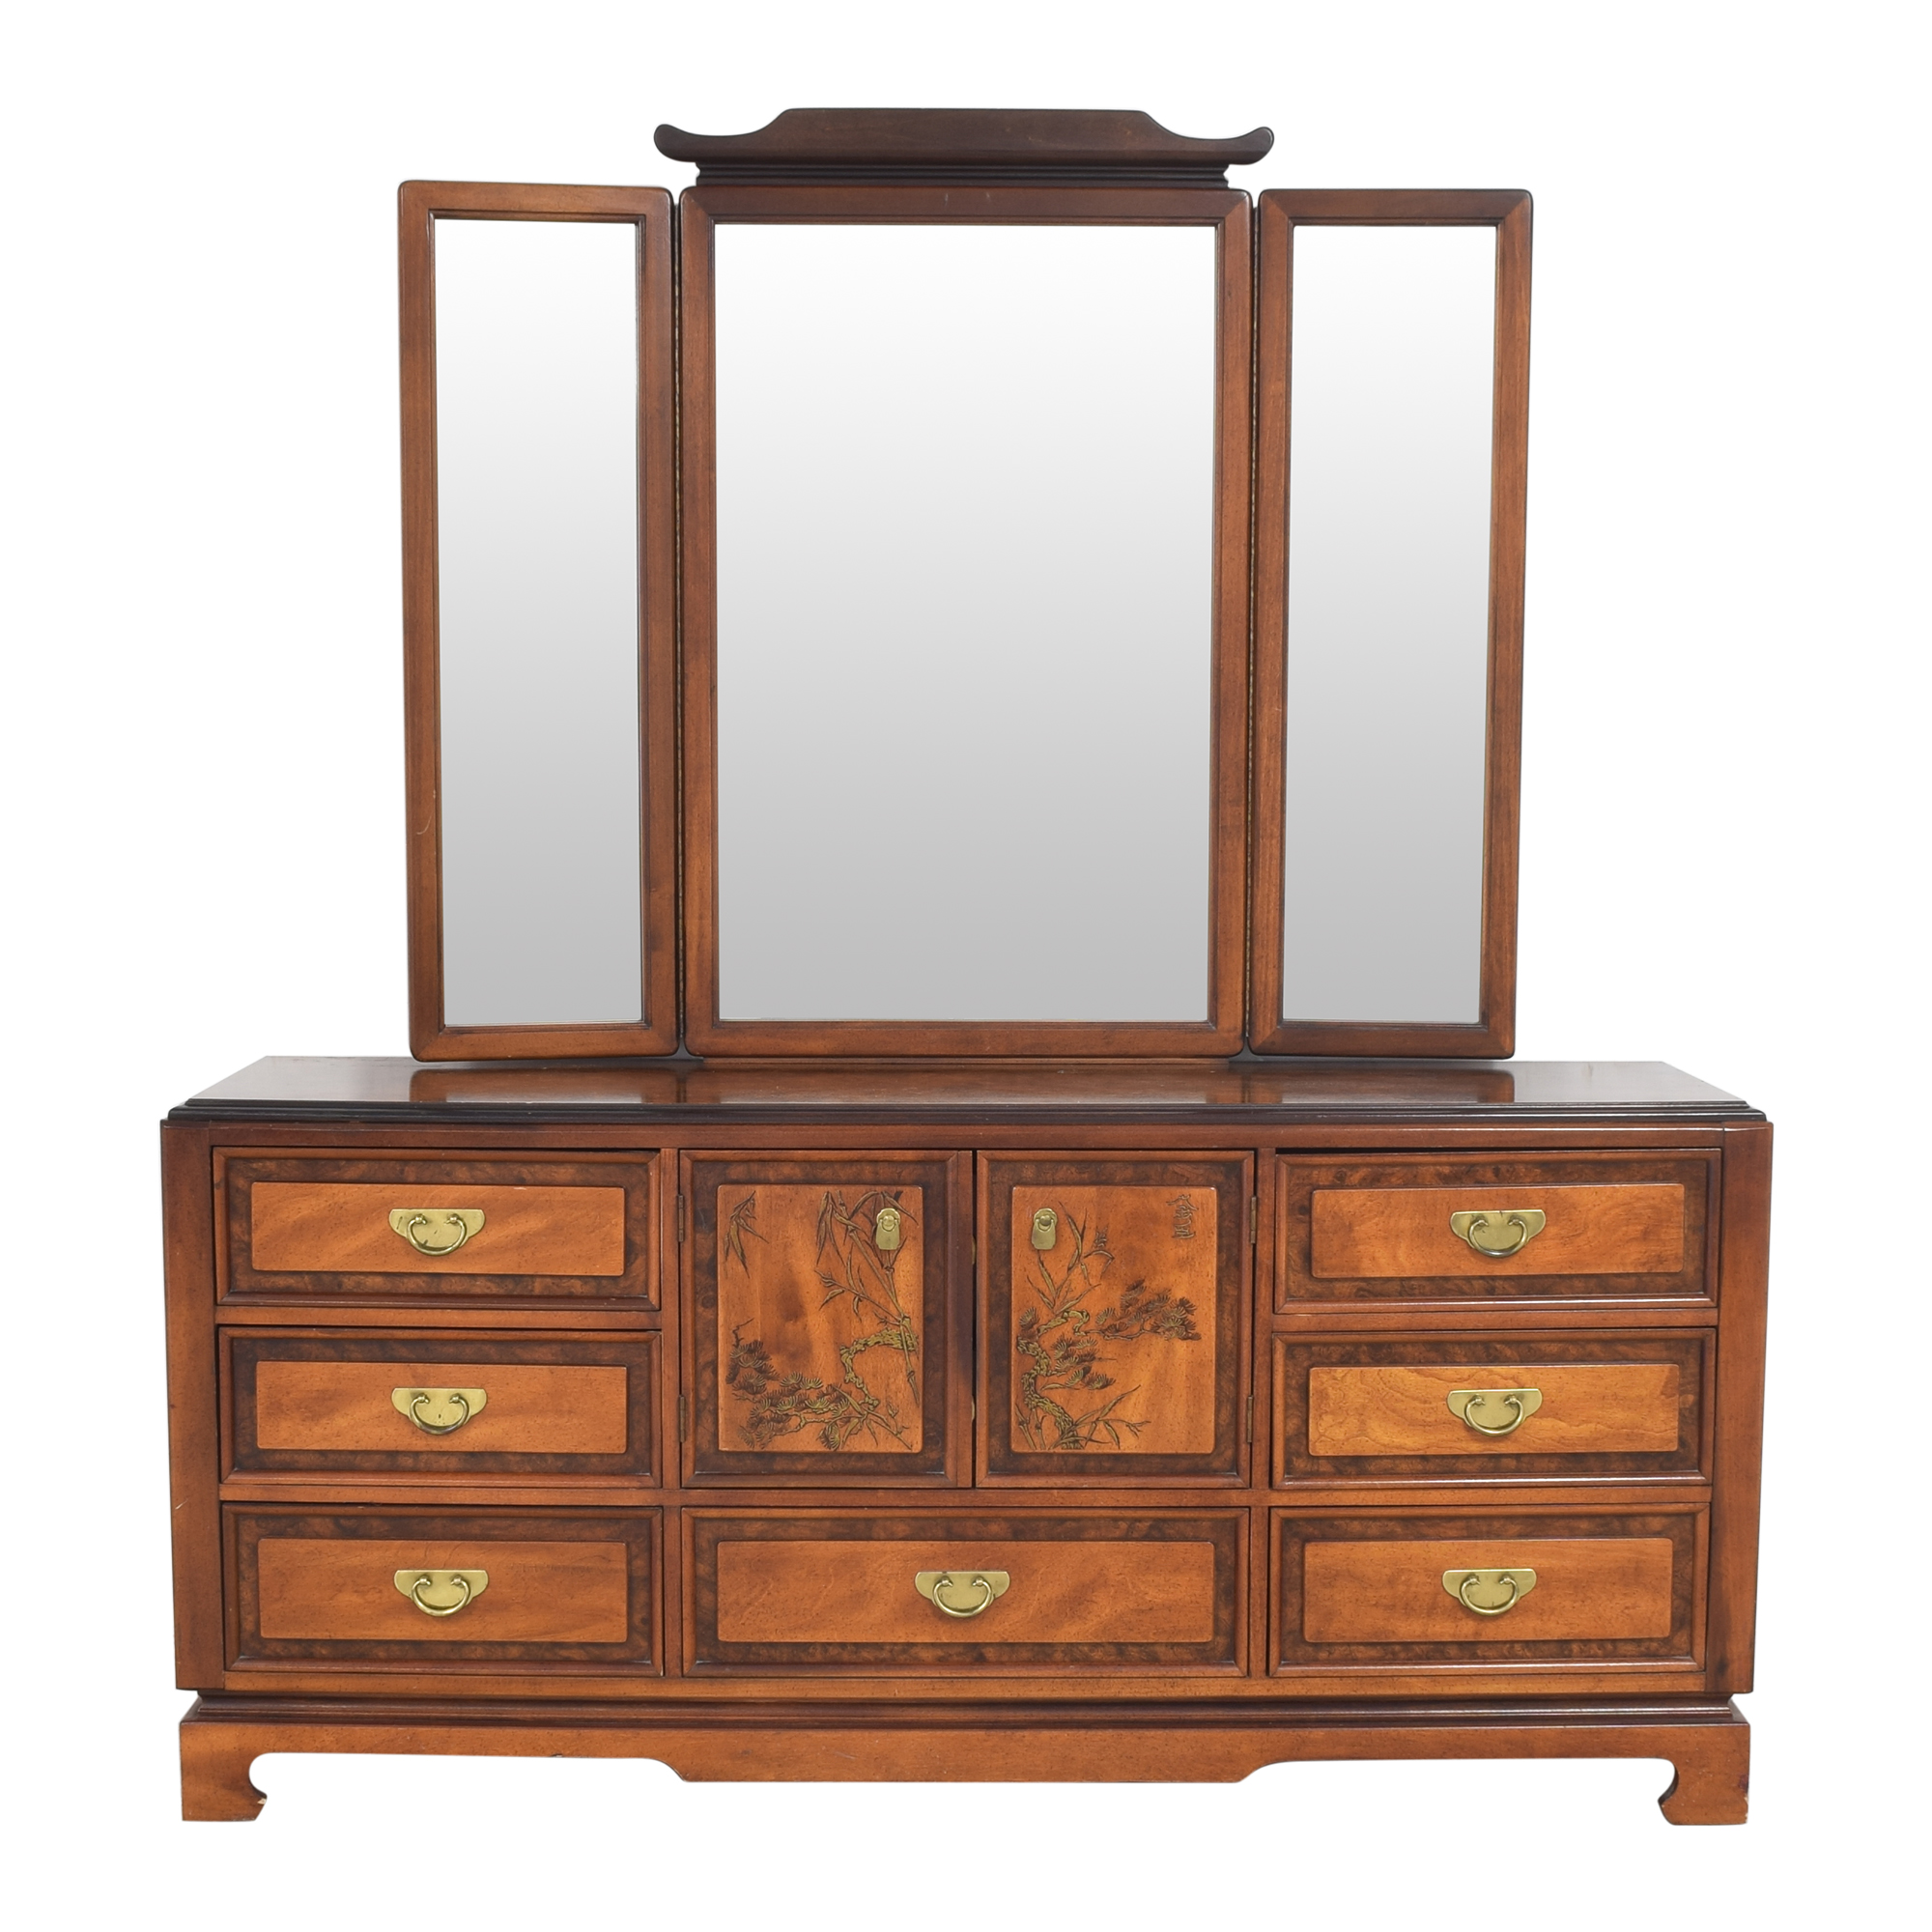 Bassett Furniture Bassett Furniture Chinoiserie Dresser with Trifold Mirror